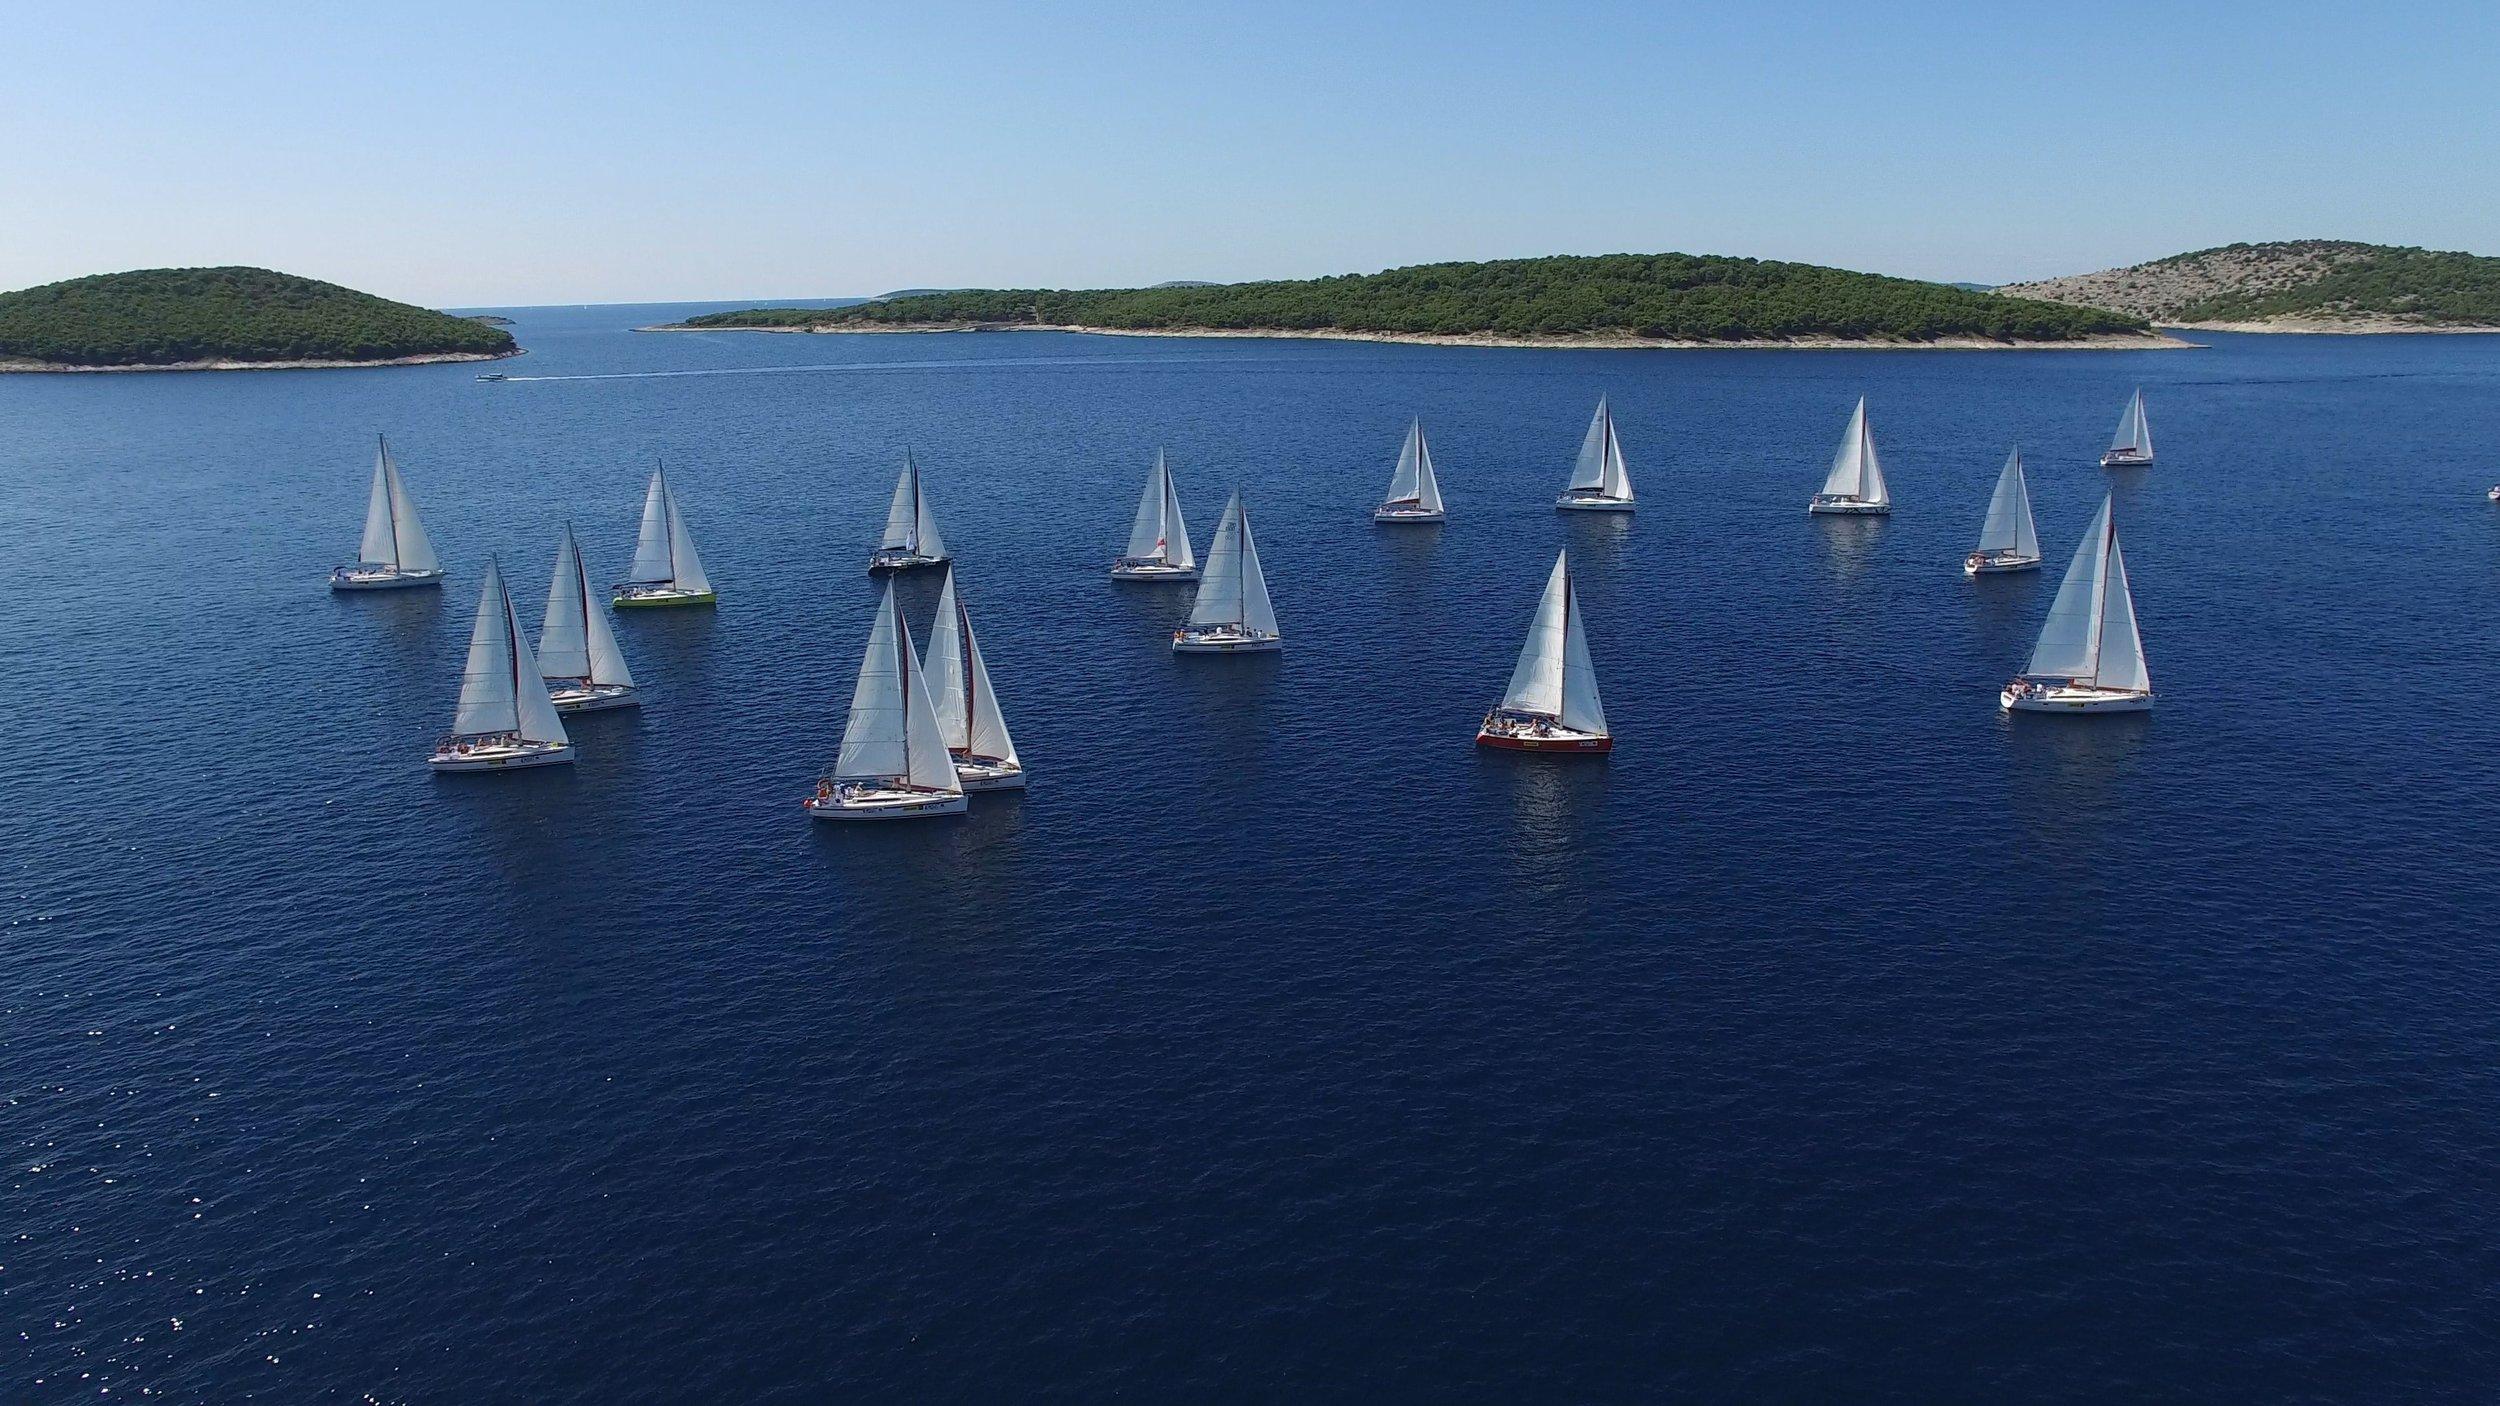 blue-boats-daylight-358326.jpg